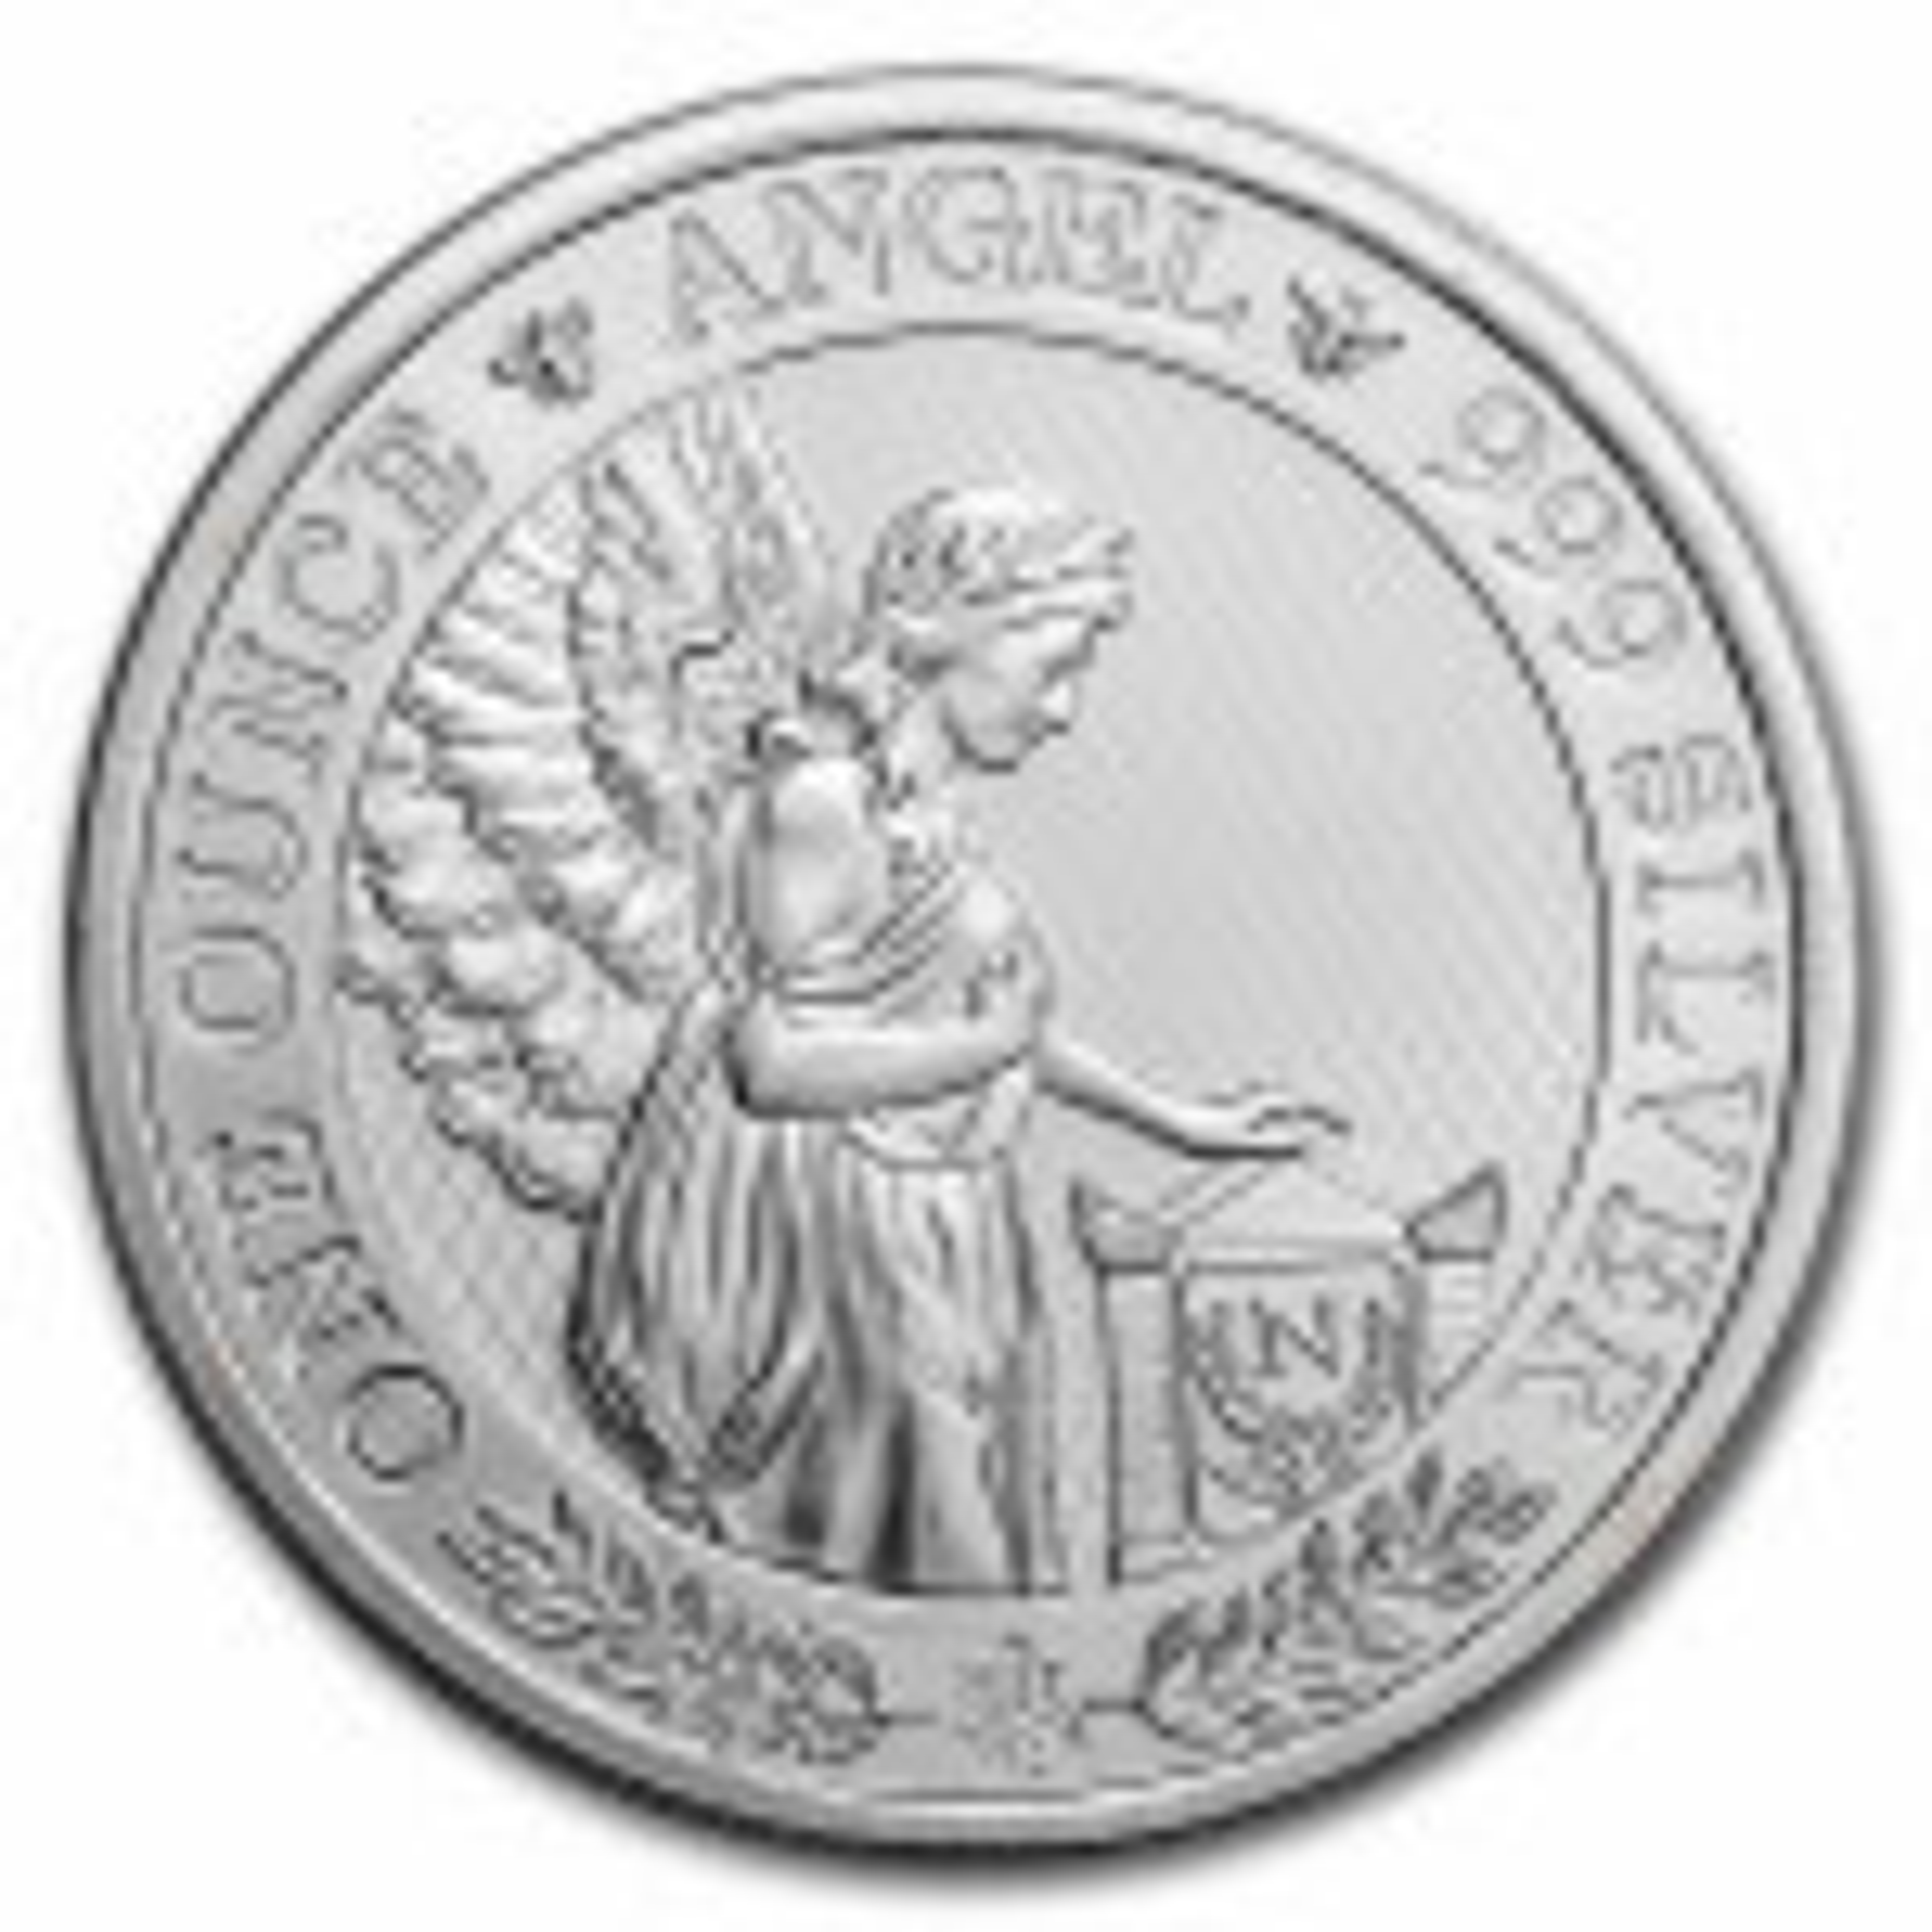 1 troy ounce zilveren munt Saint-Helena engel 2021